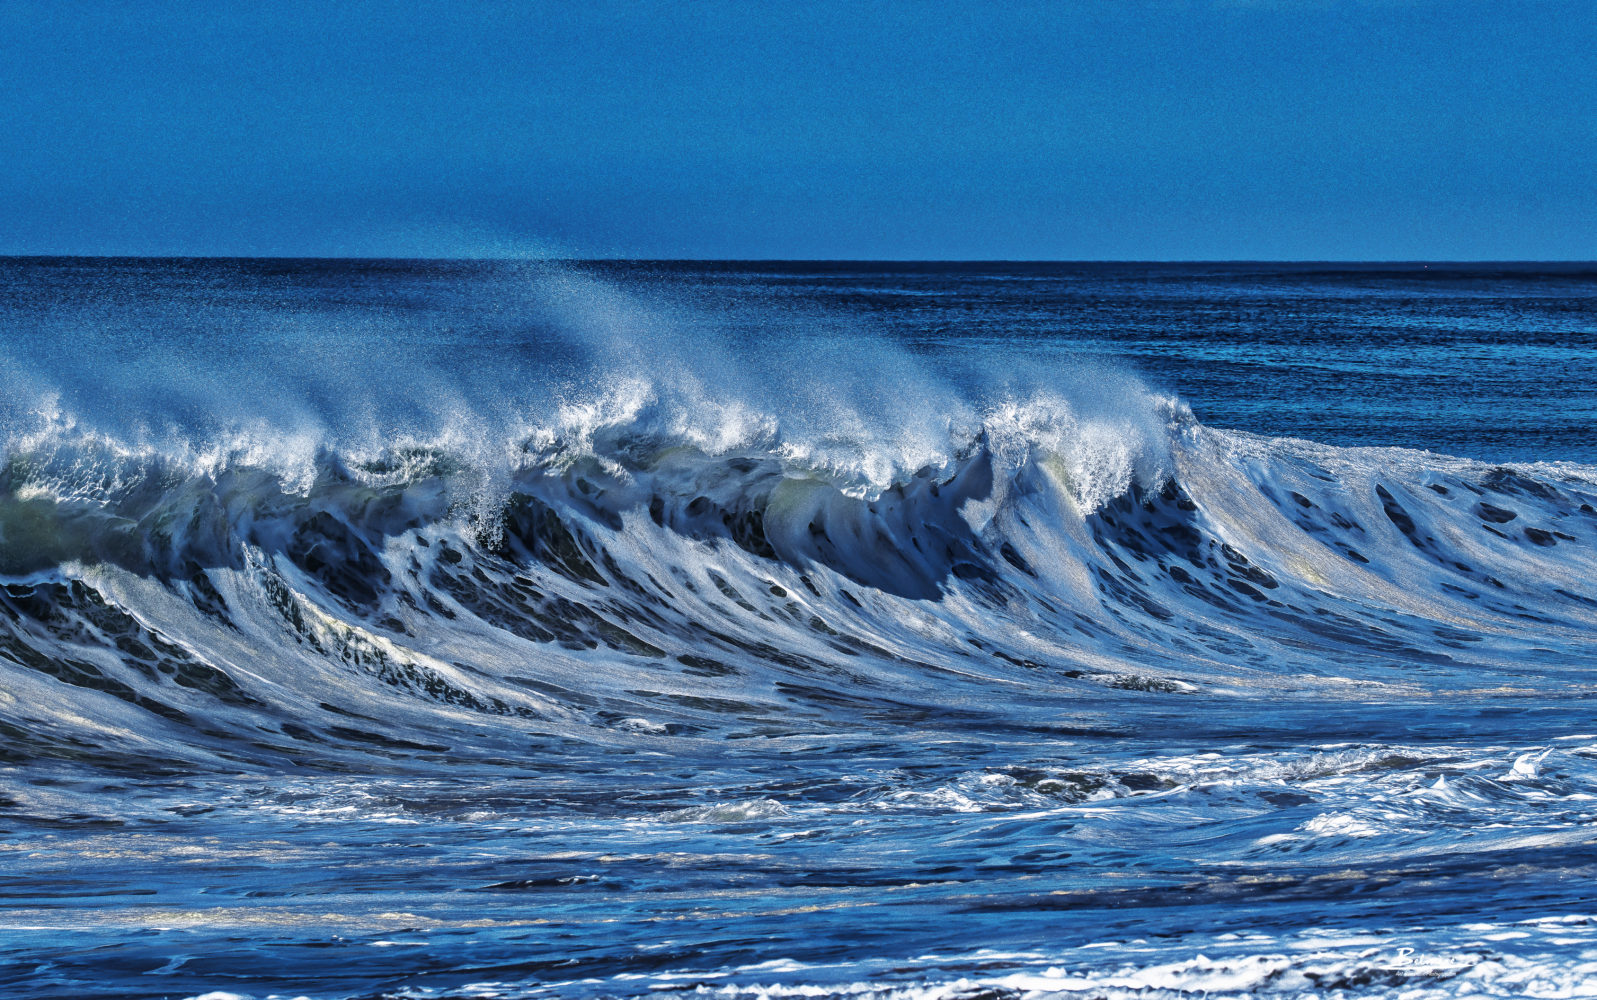 L'océan by Jean-Victor Belmère Photographe d'Art